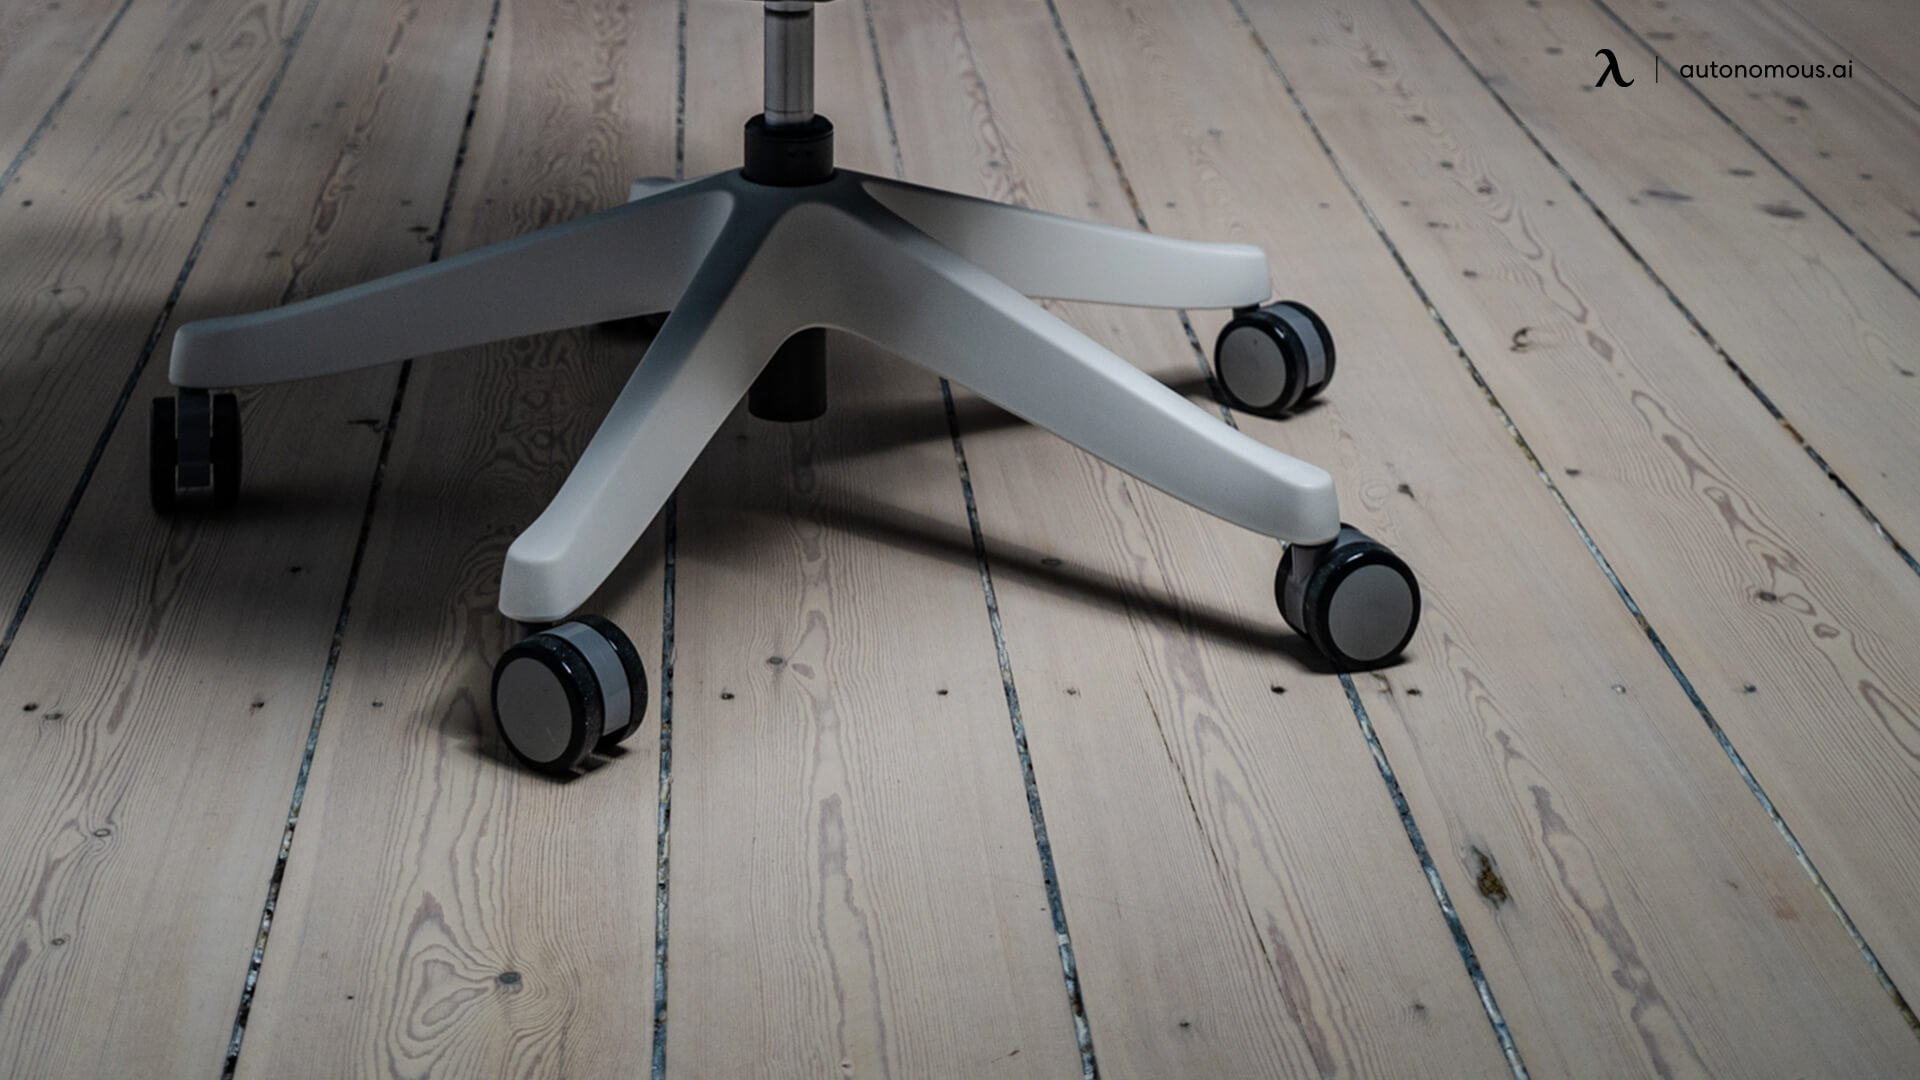 Repairing the wheels to protect wood floor